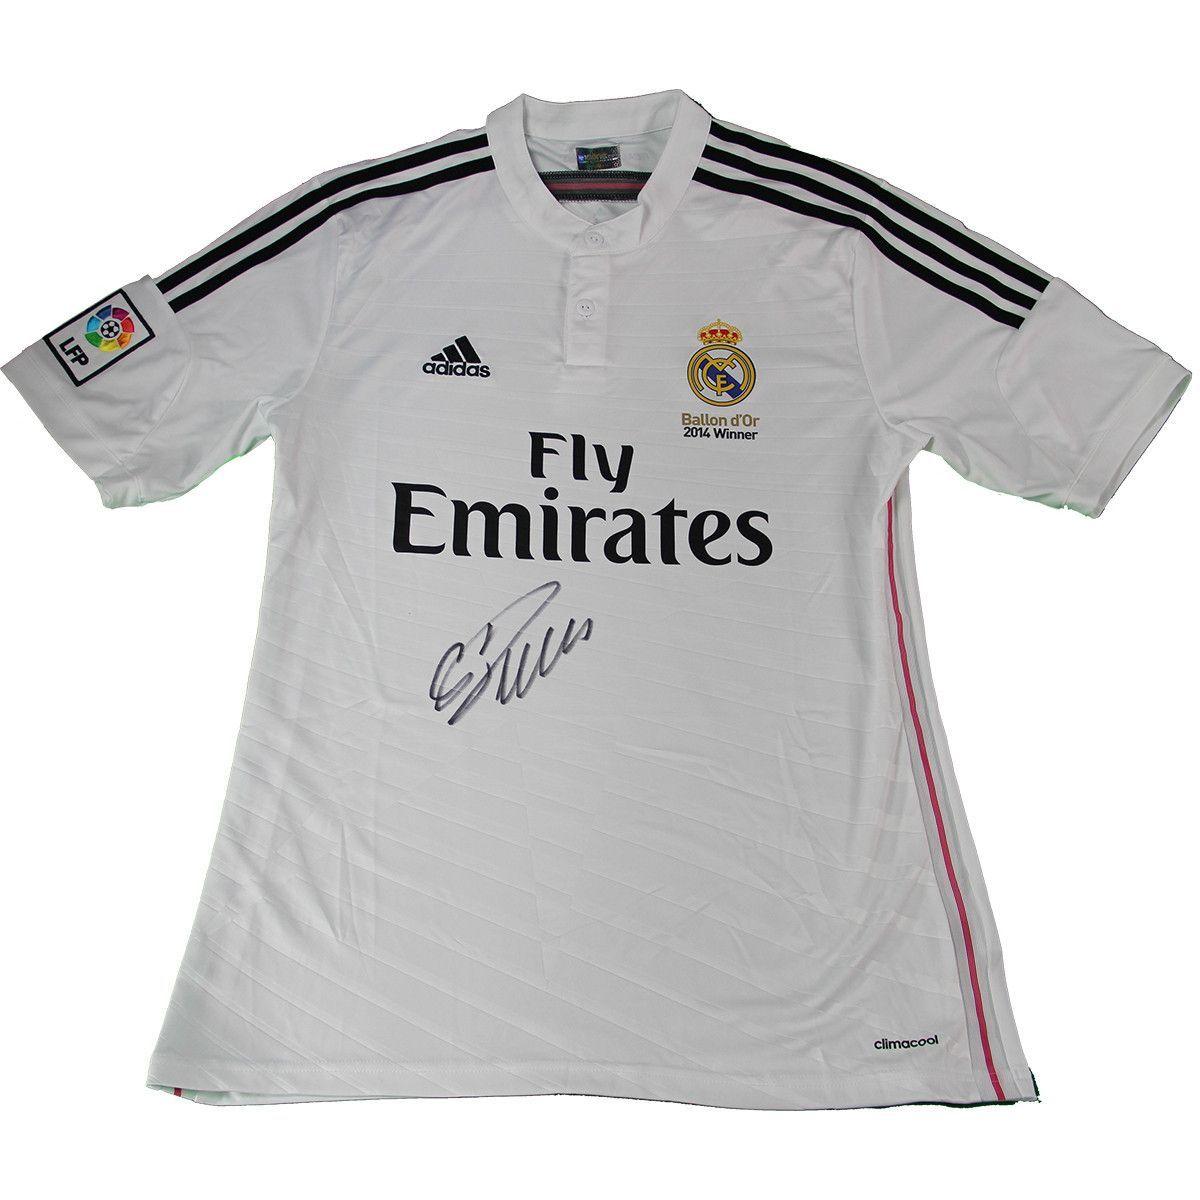 watch 5ce67 87af3 Real Madrid Cristiano Ronaldo Jersey Pink Diamond